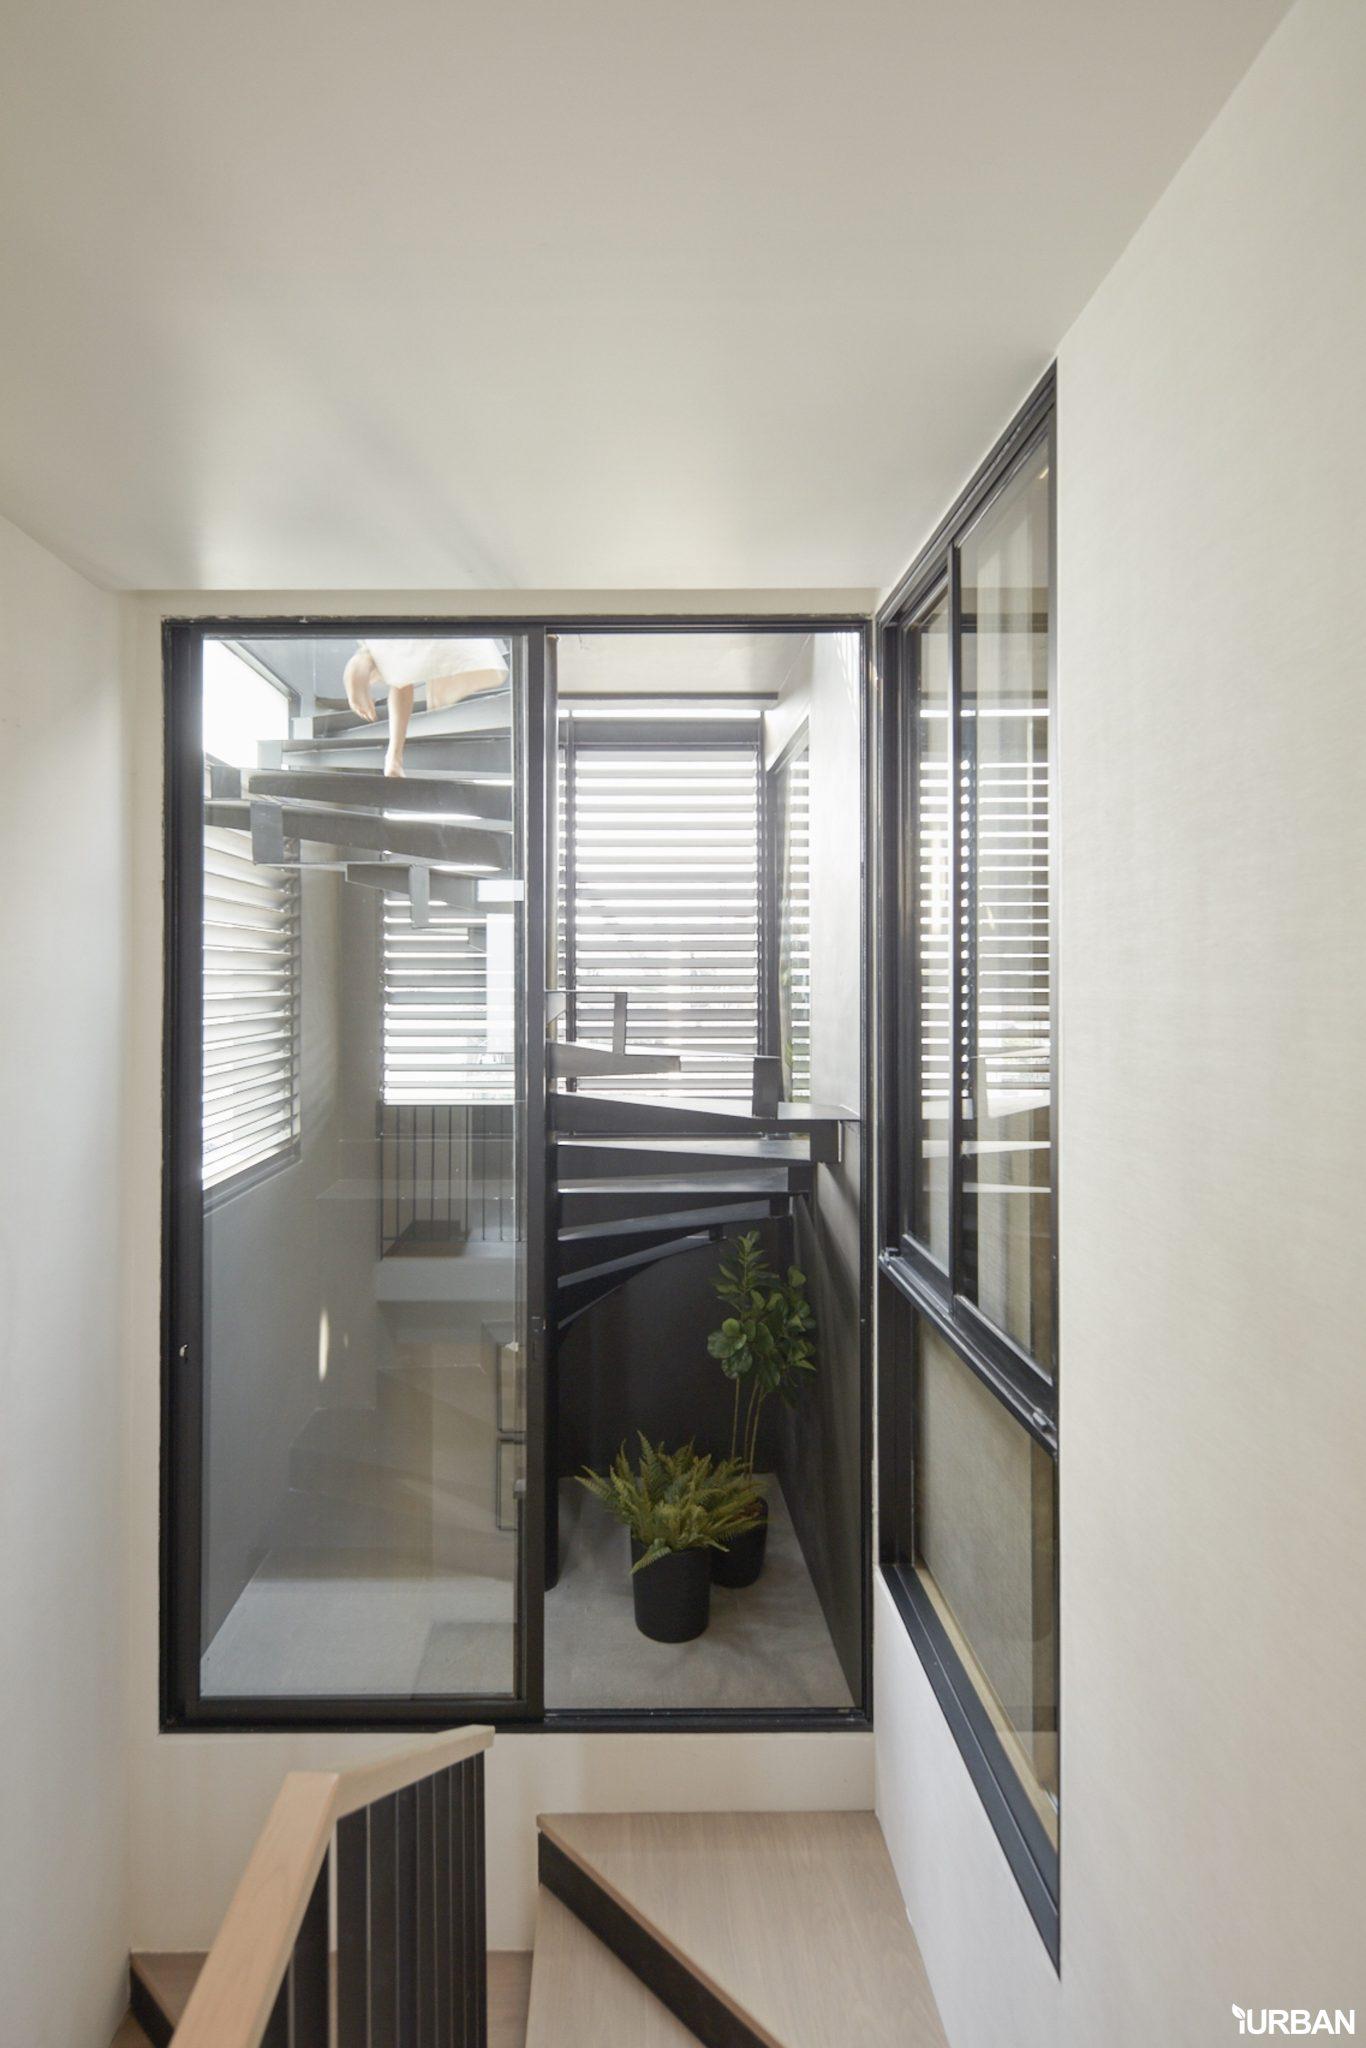 AIRES RAMA9 รีวิว Luxury Townhome 3.5 ชั้น + Rooftop ออกแบบสวย ย่านพระราม9 (ใกล้ รพ.สมิติเวช) 82 - AIRES